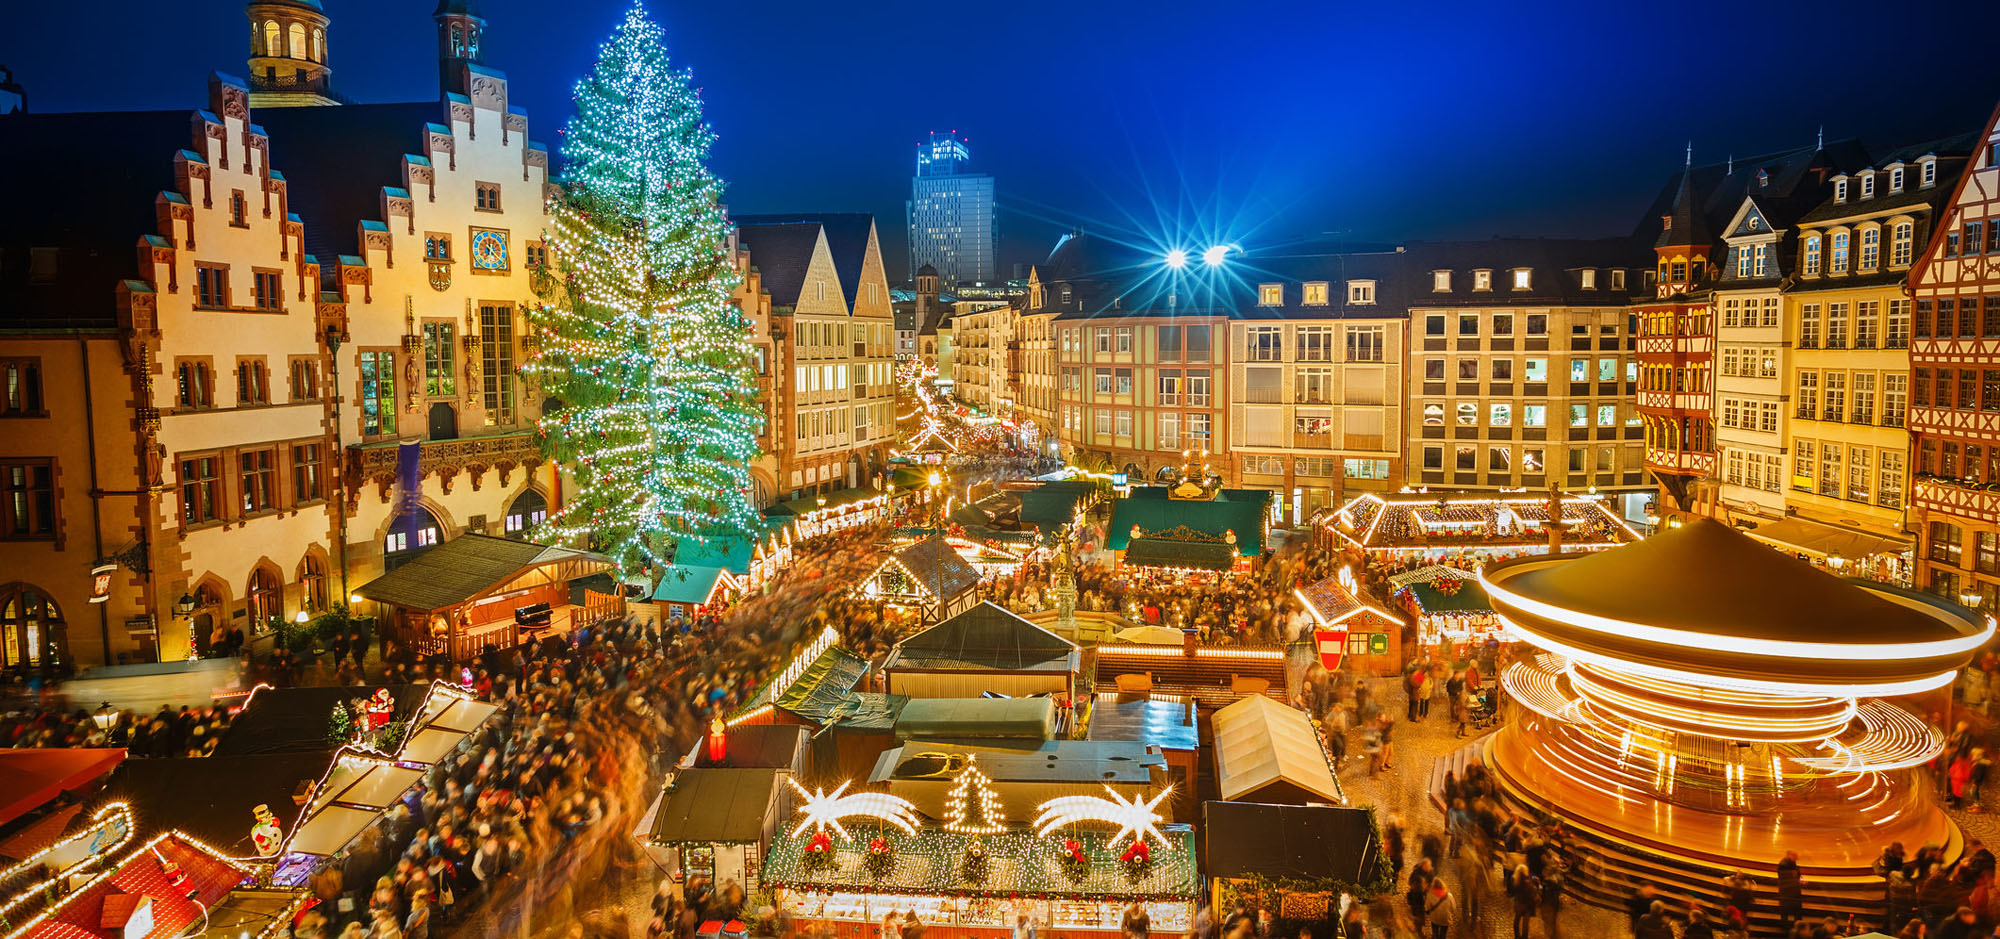 Castles and Christmas Carols